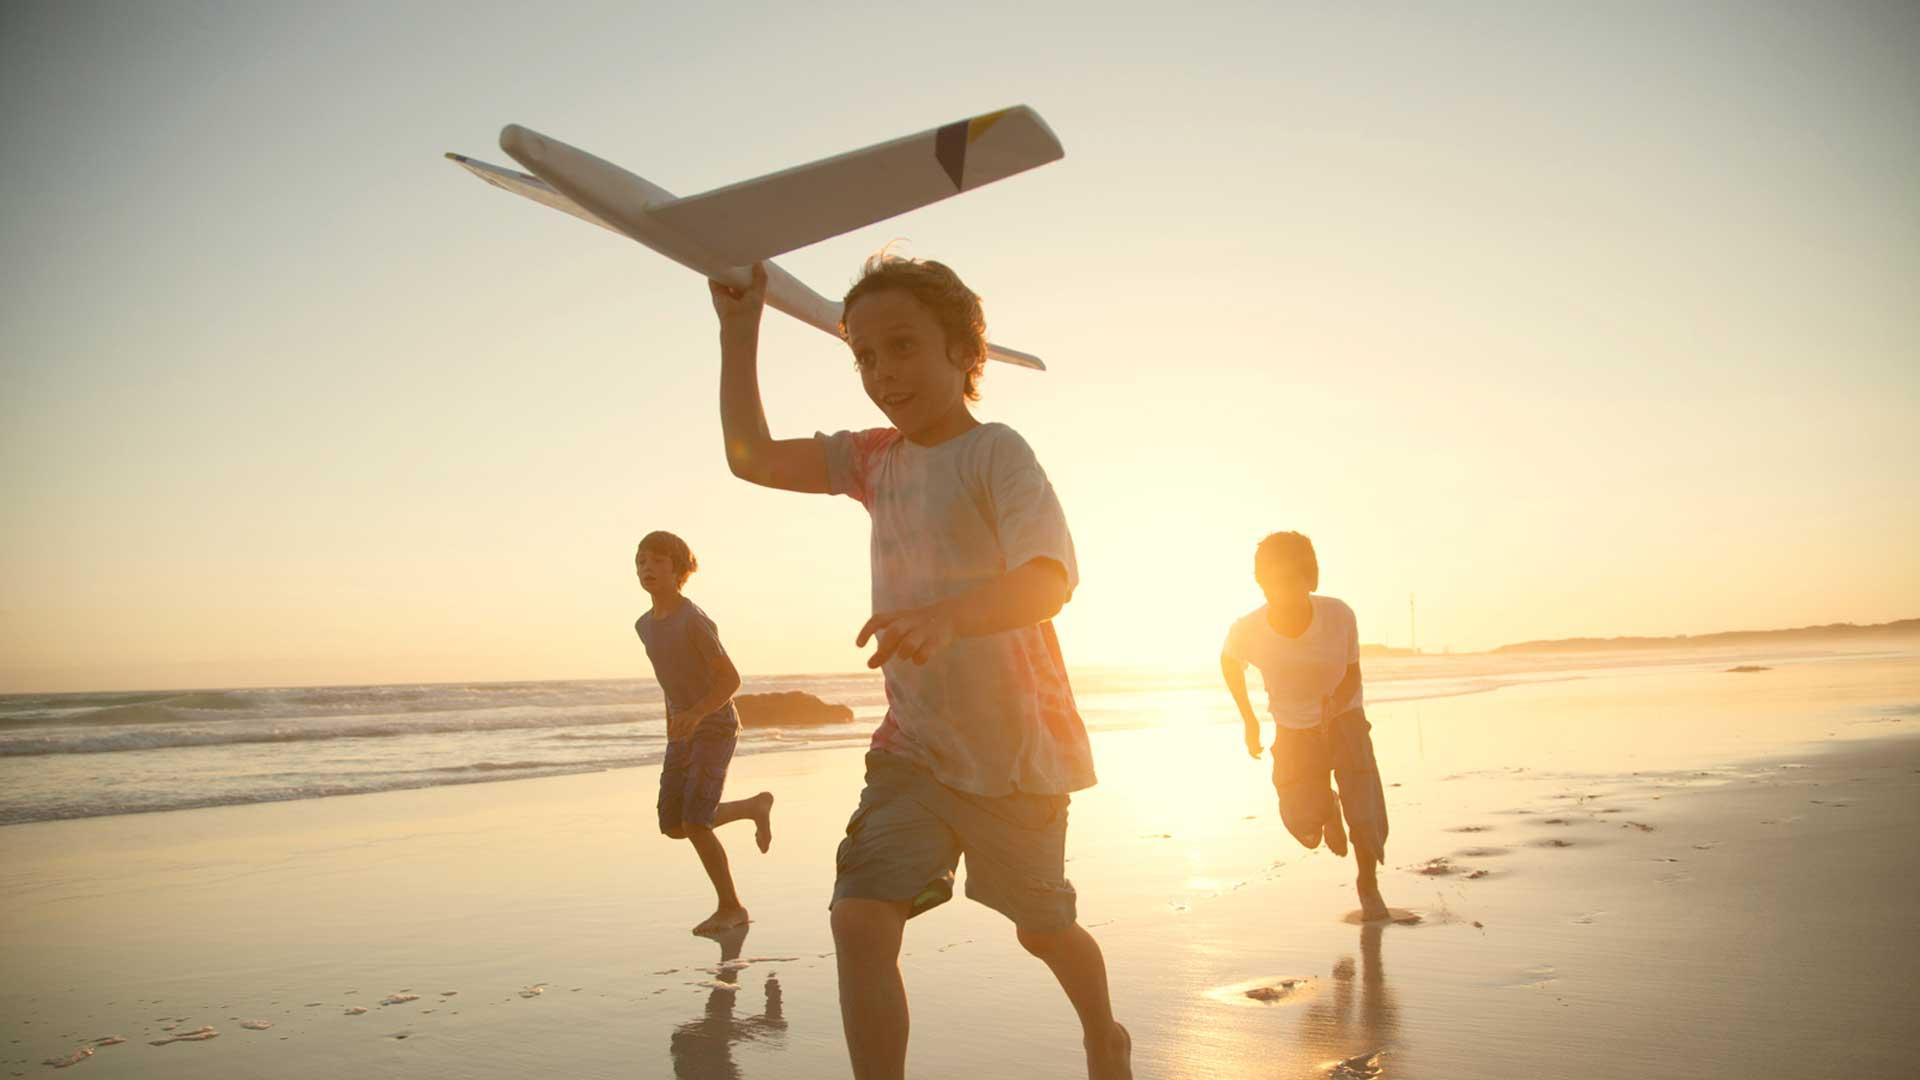 boys on beach with toy plane